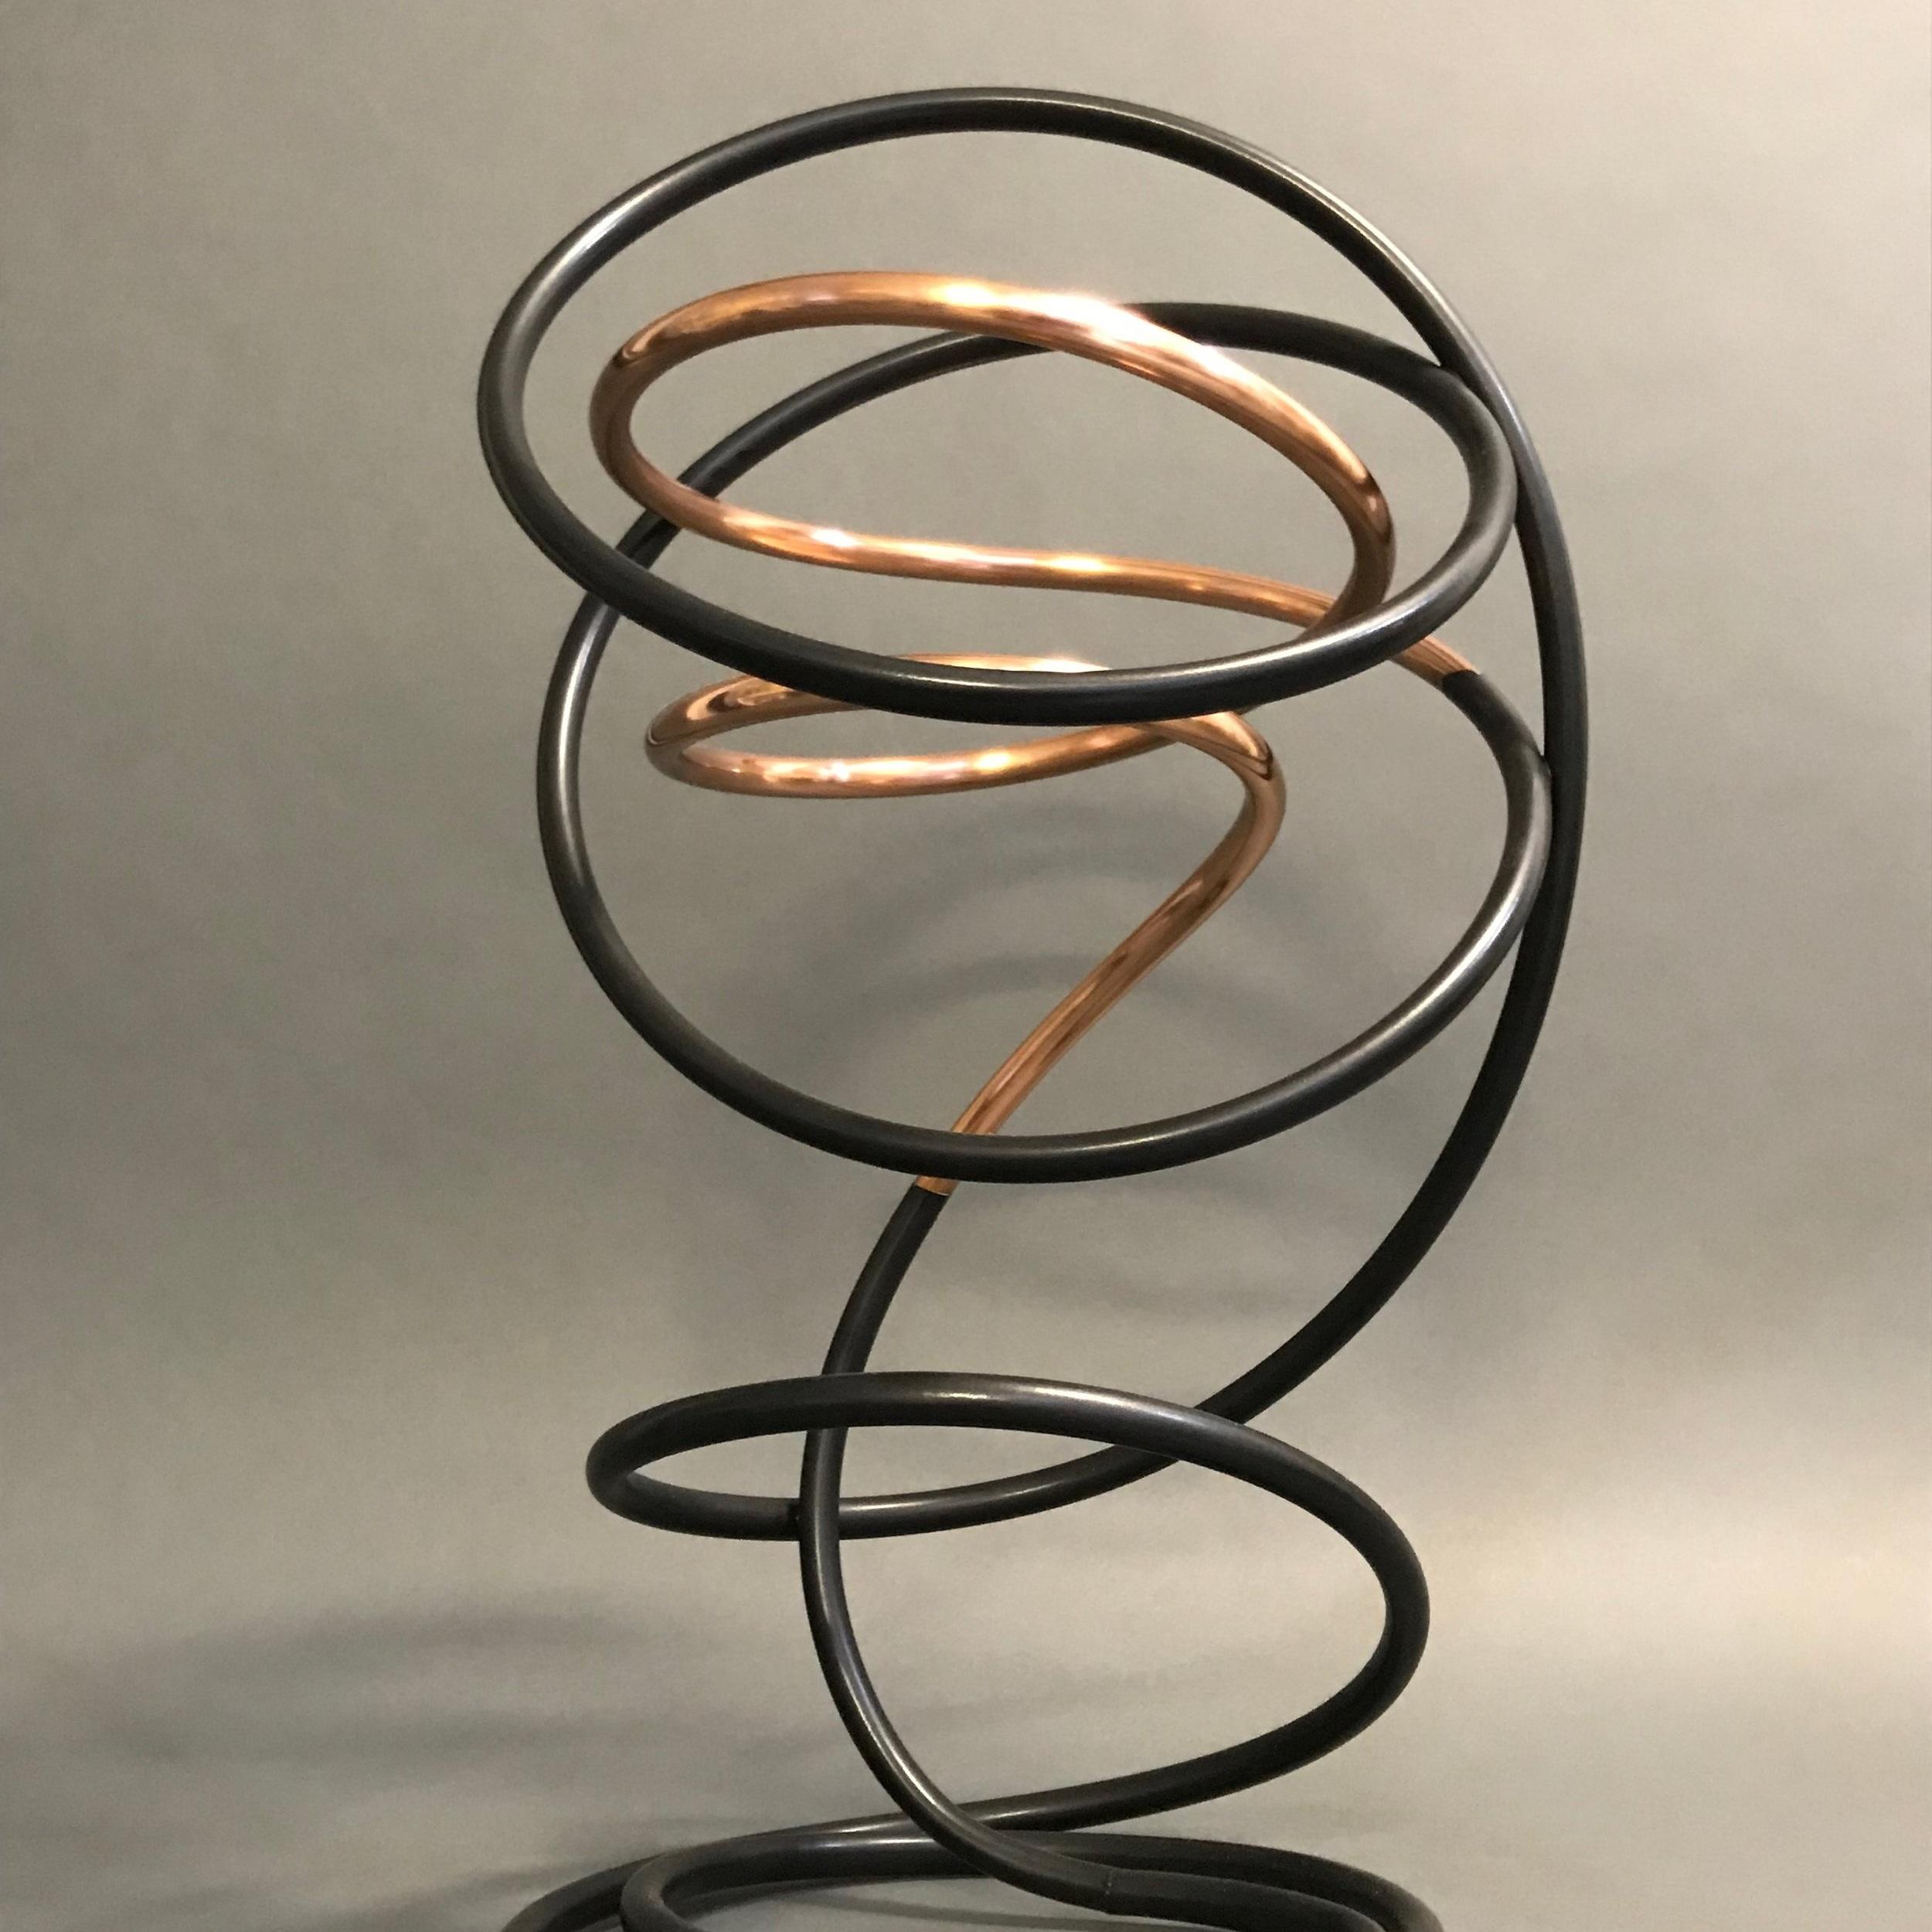 Copper in Black Spiral